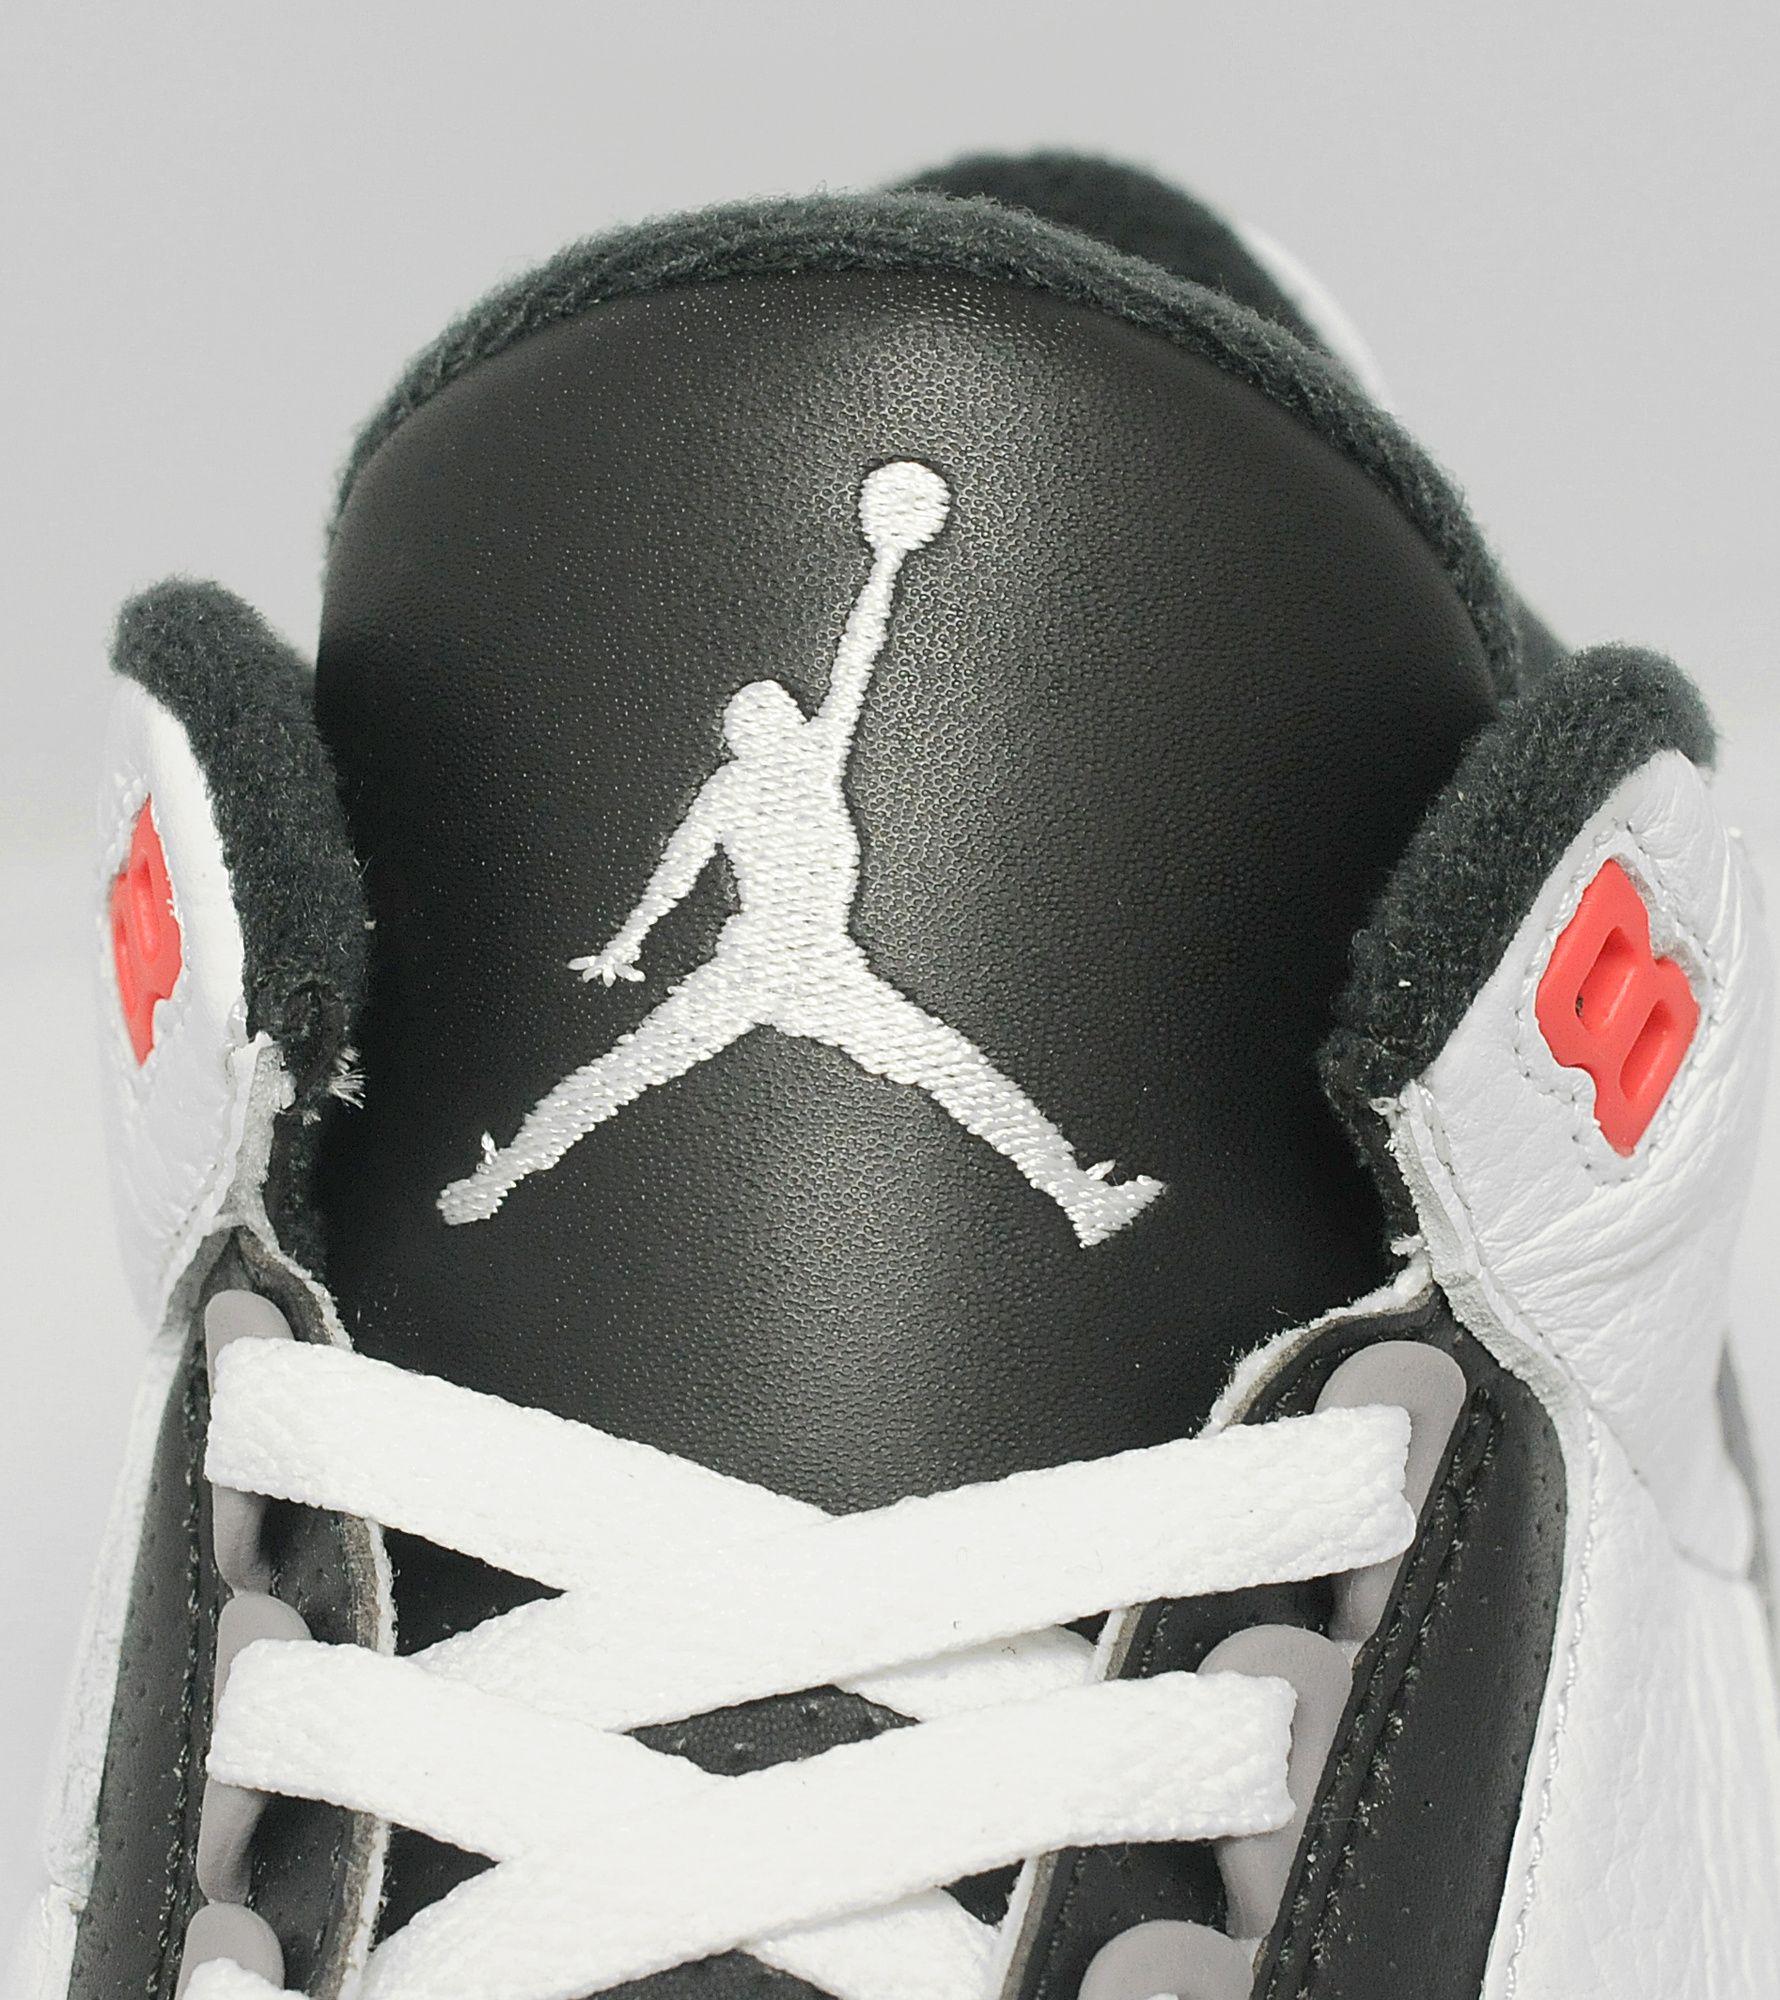 Jordan III 'Infrared 23'